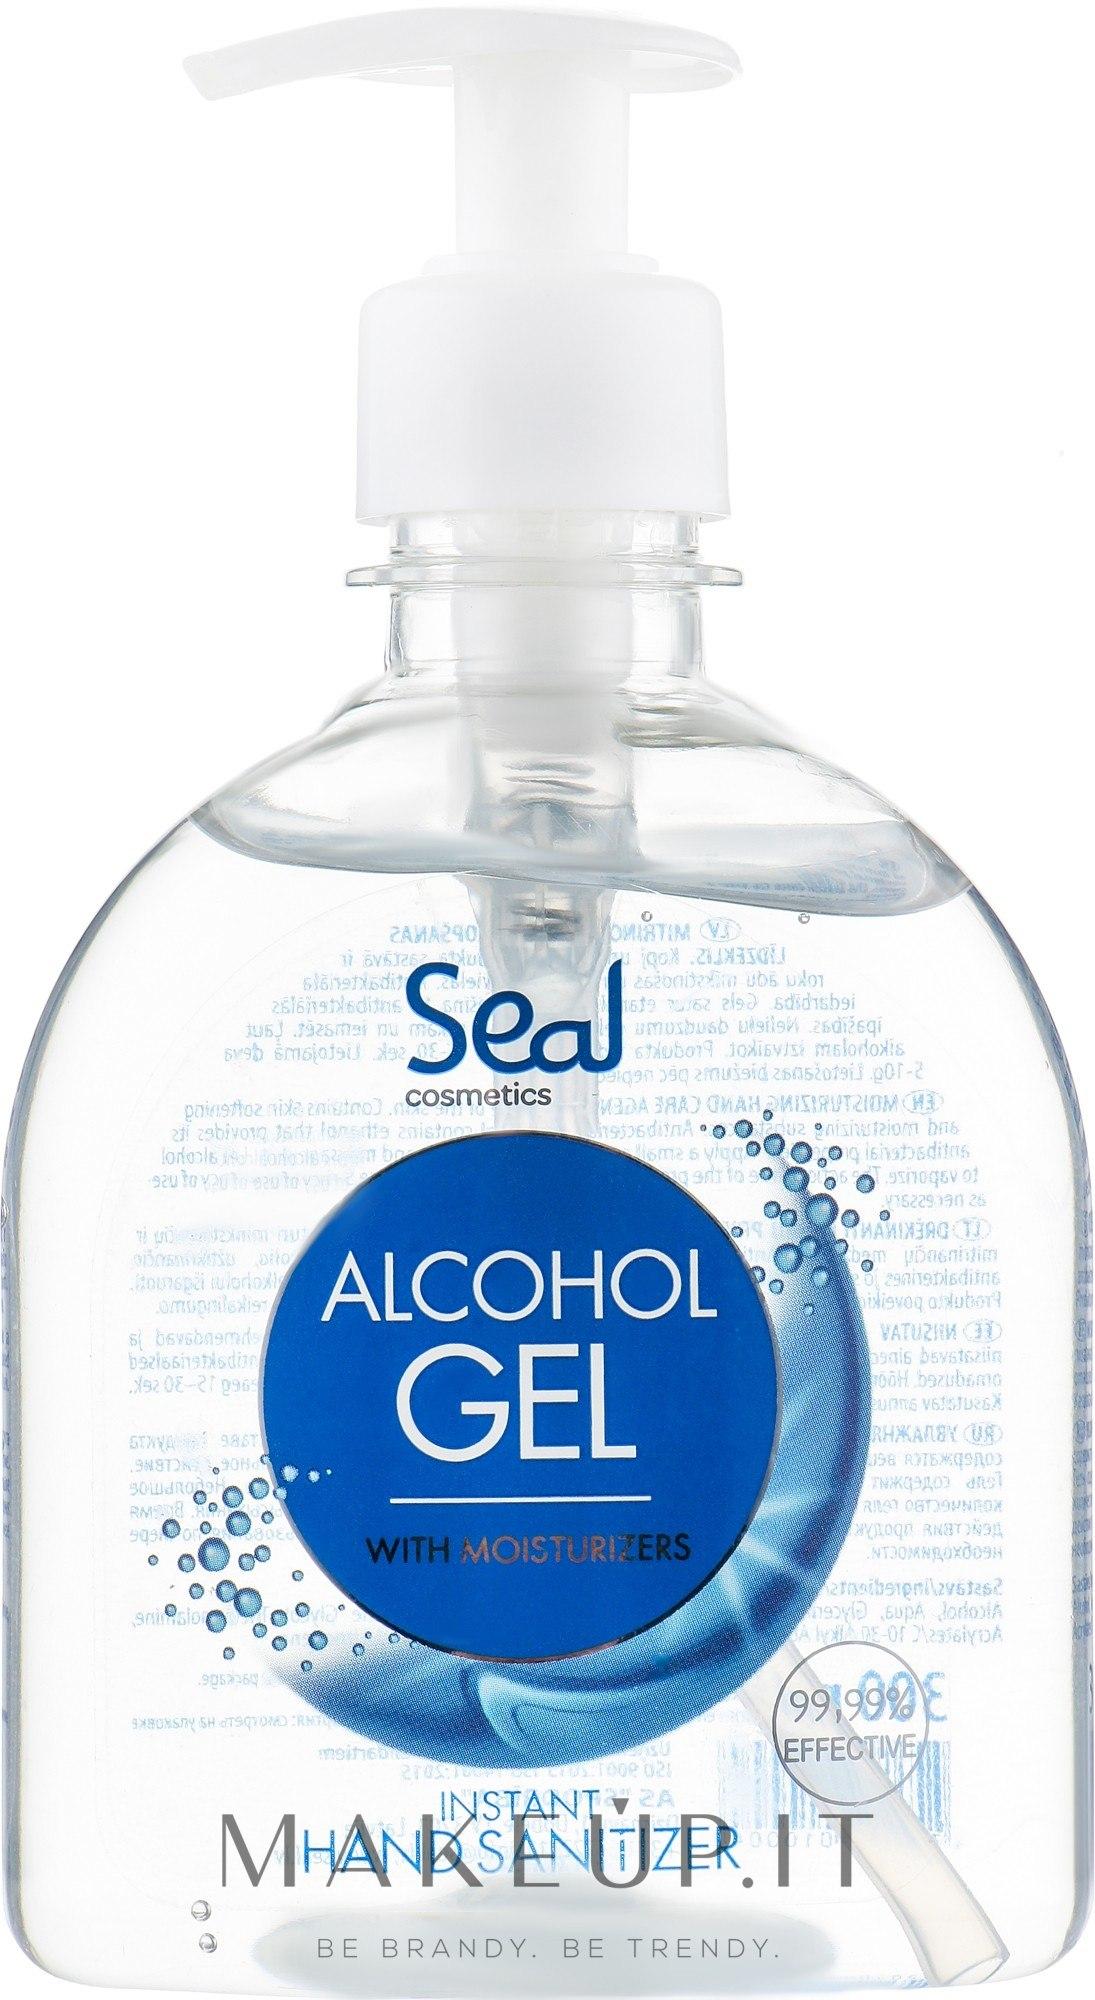 Gel disinfettante per le mani - Seal Cosmetics Alcohol Gel Hand Sanitizer — foto 300 ml